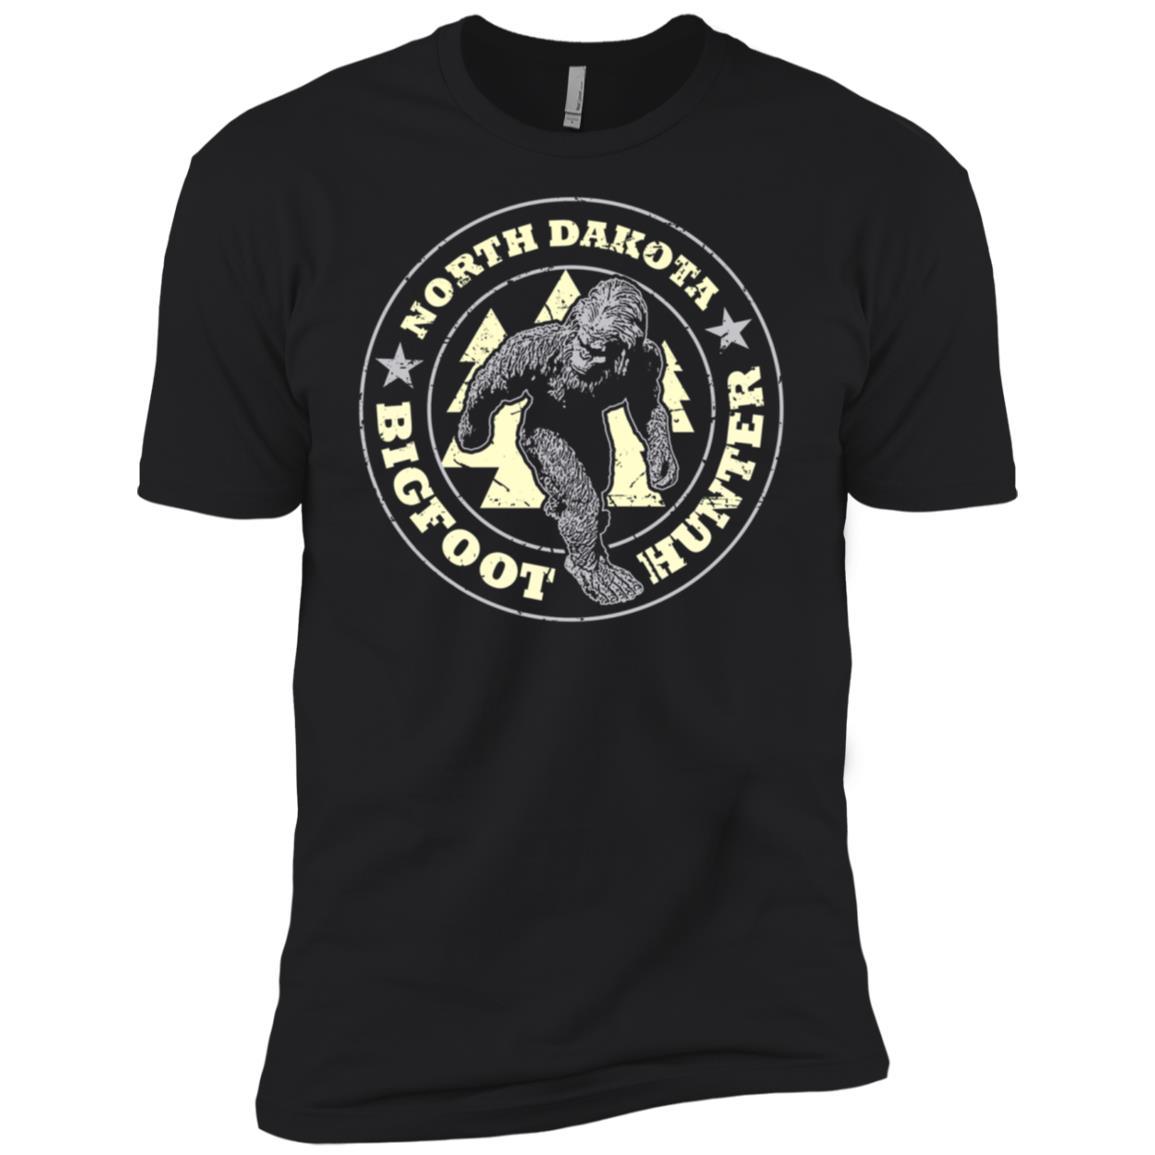 North Dakota Bigfoot Hunter Believe Men Short Sleeve T-Shirt